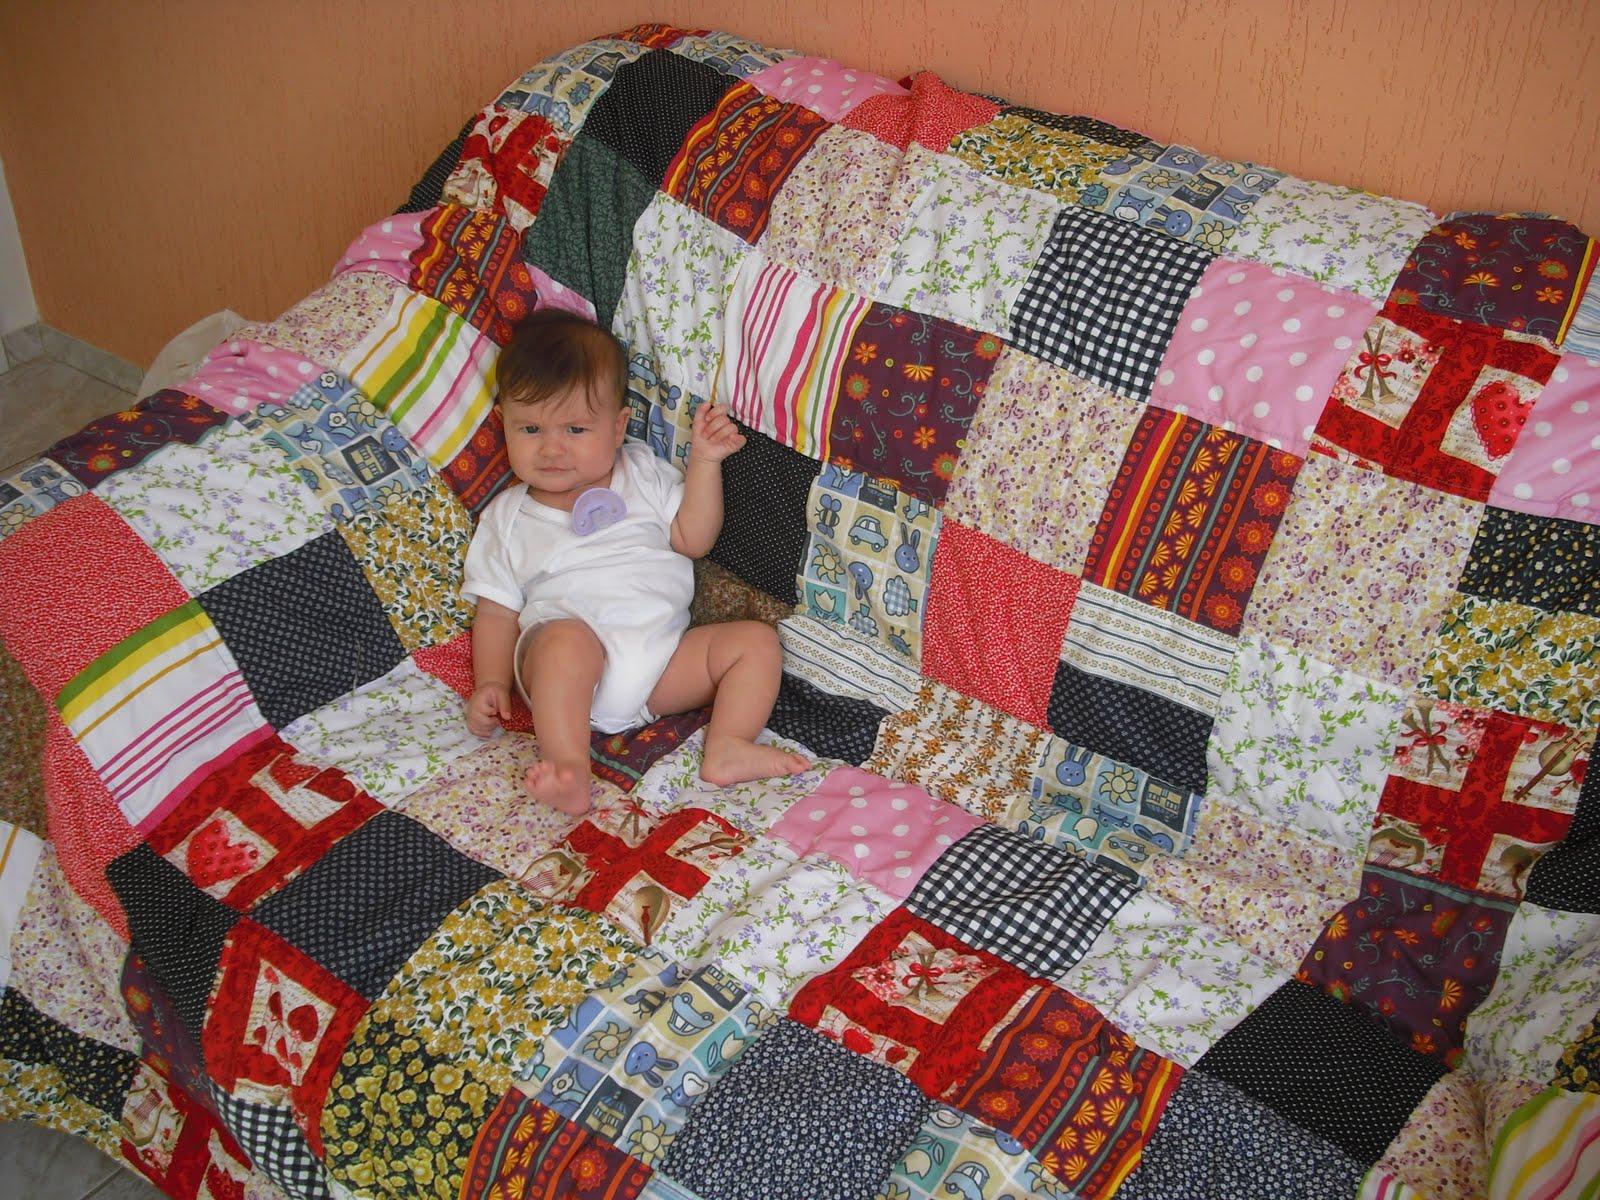 Stella hoff patchwork colchas de retalho - Colcha patchwork ...